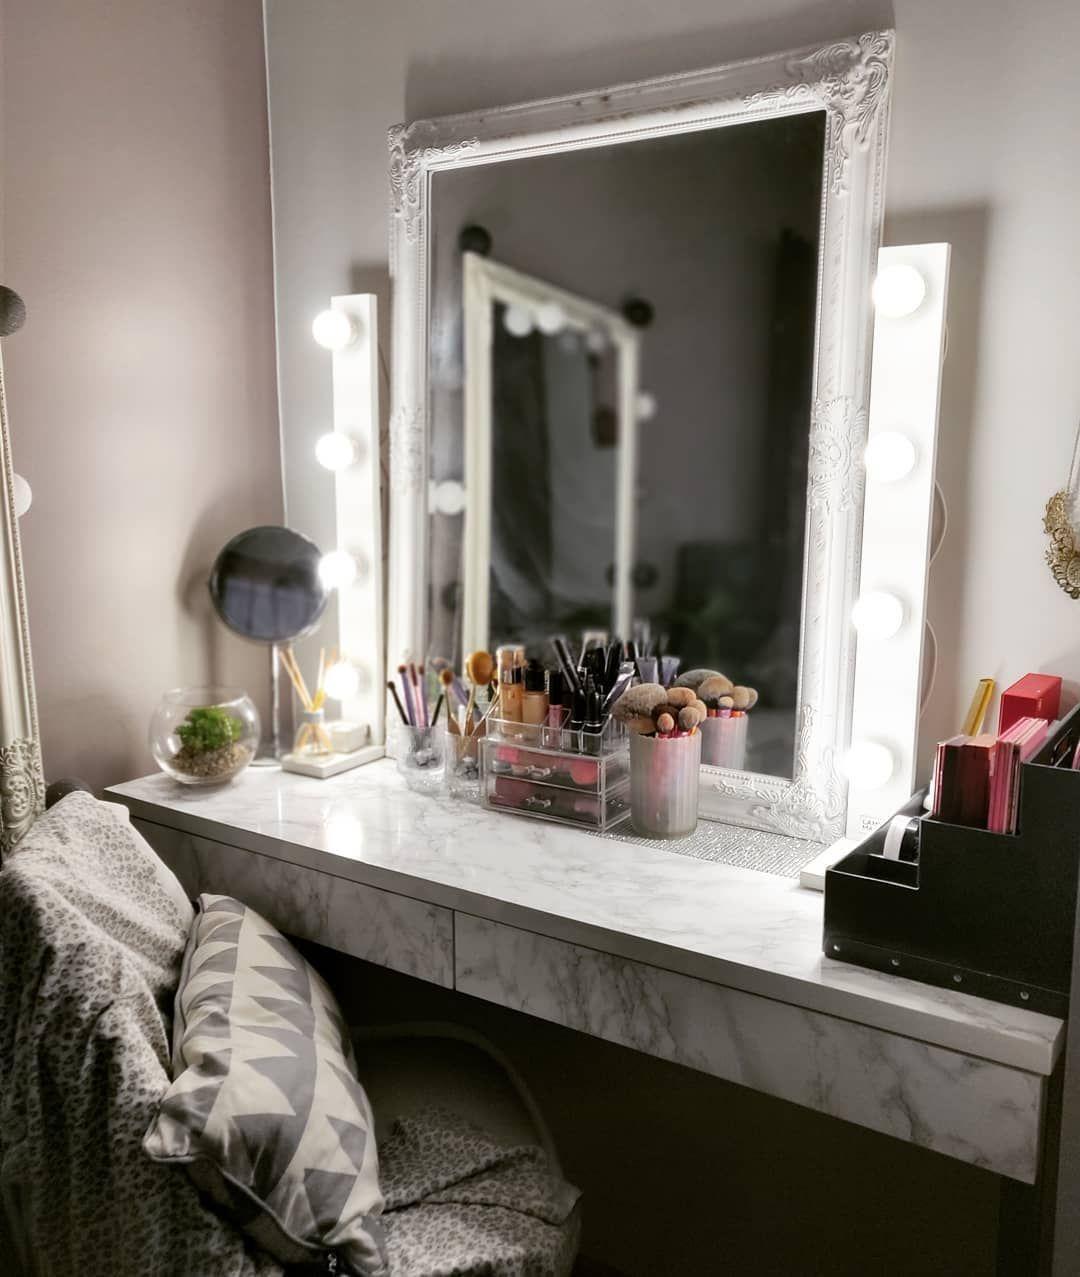 best lamp for makeup, electric light up makeup mirror, led